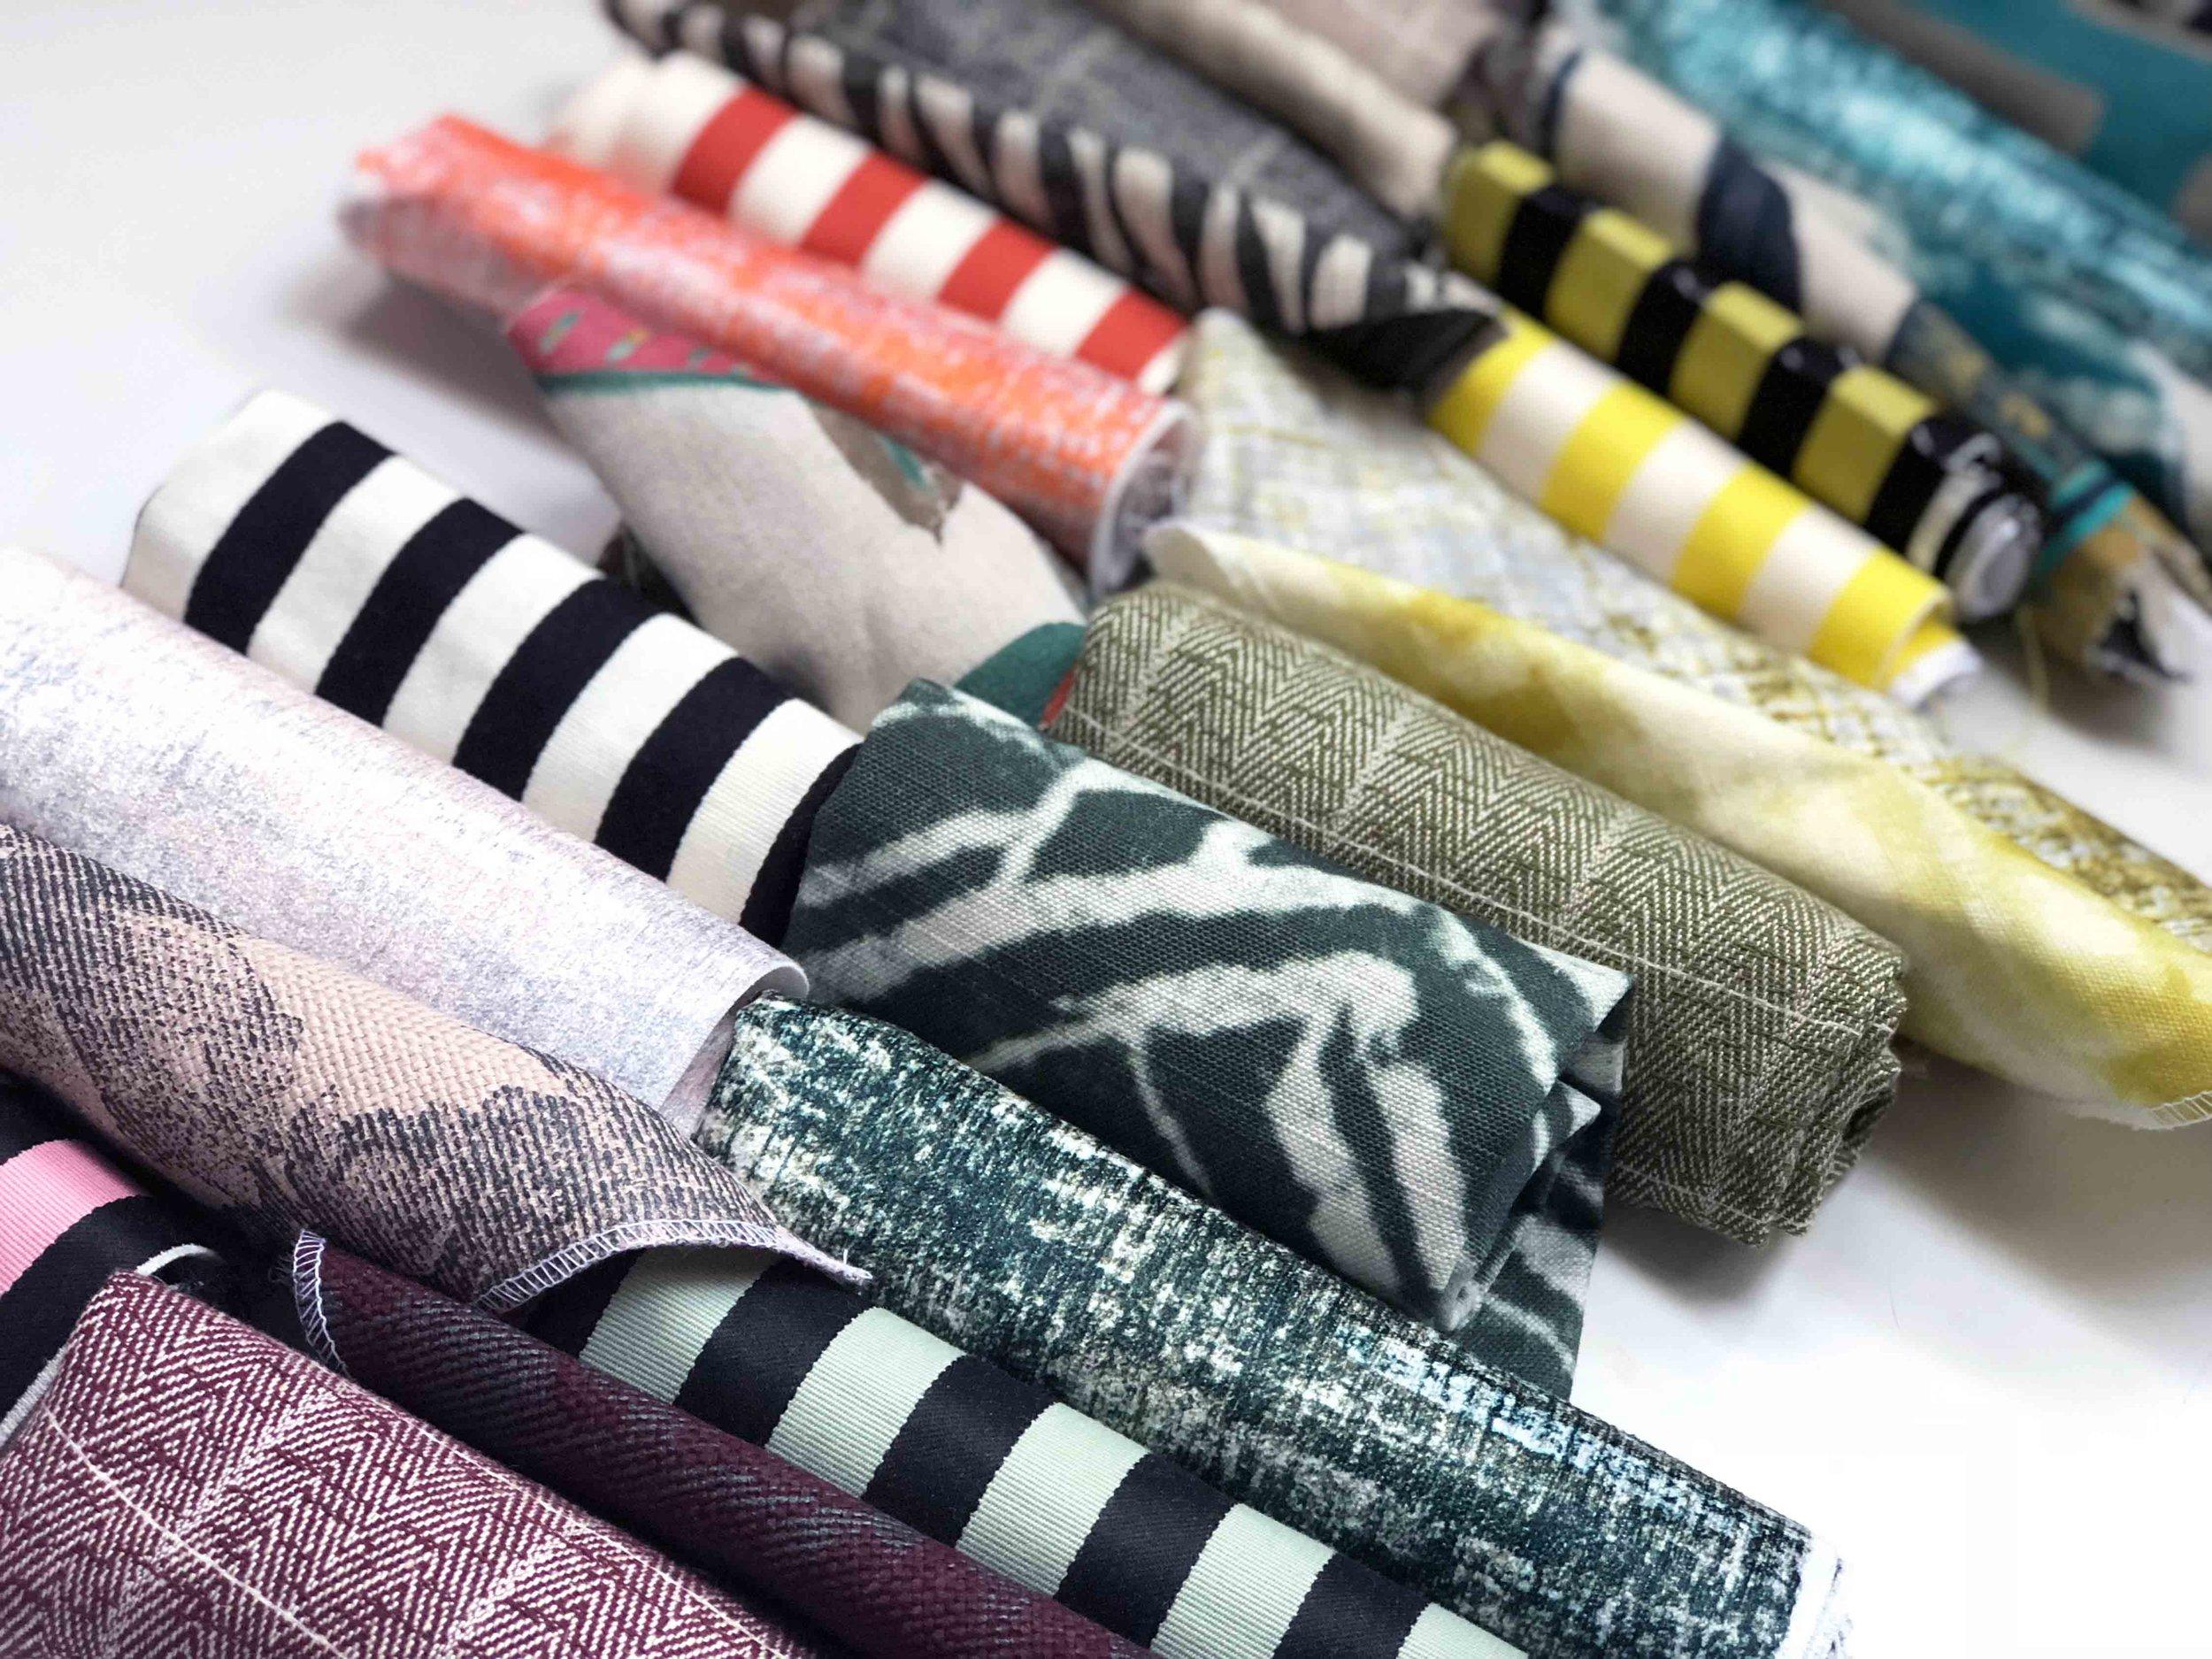 Fil-Doux-Textiles-Coast-to-Coast-12.jpg